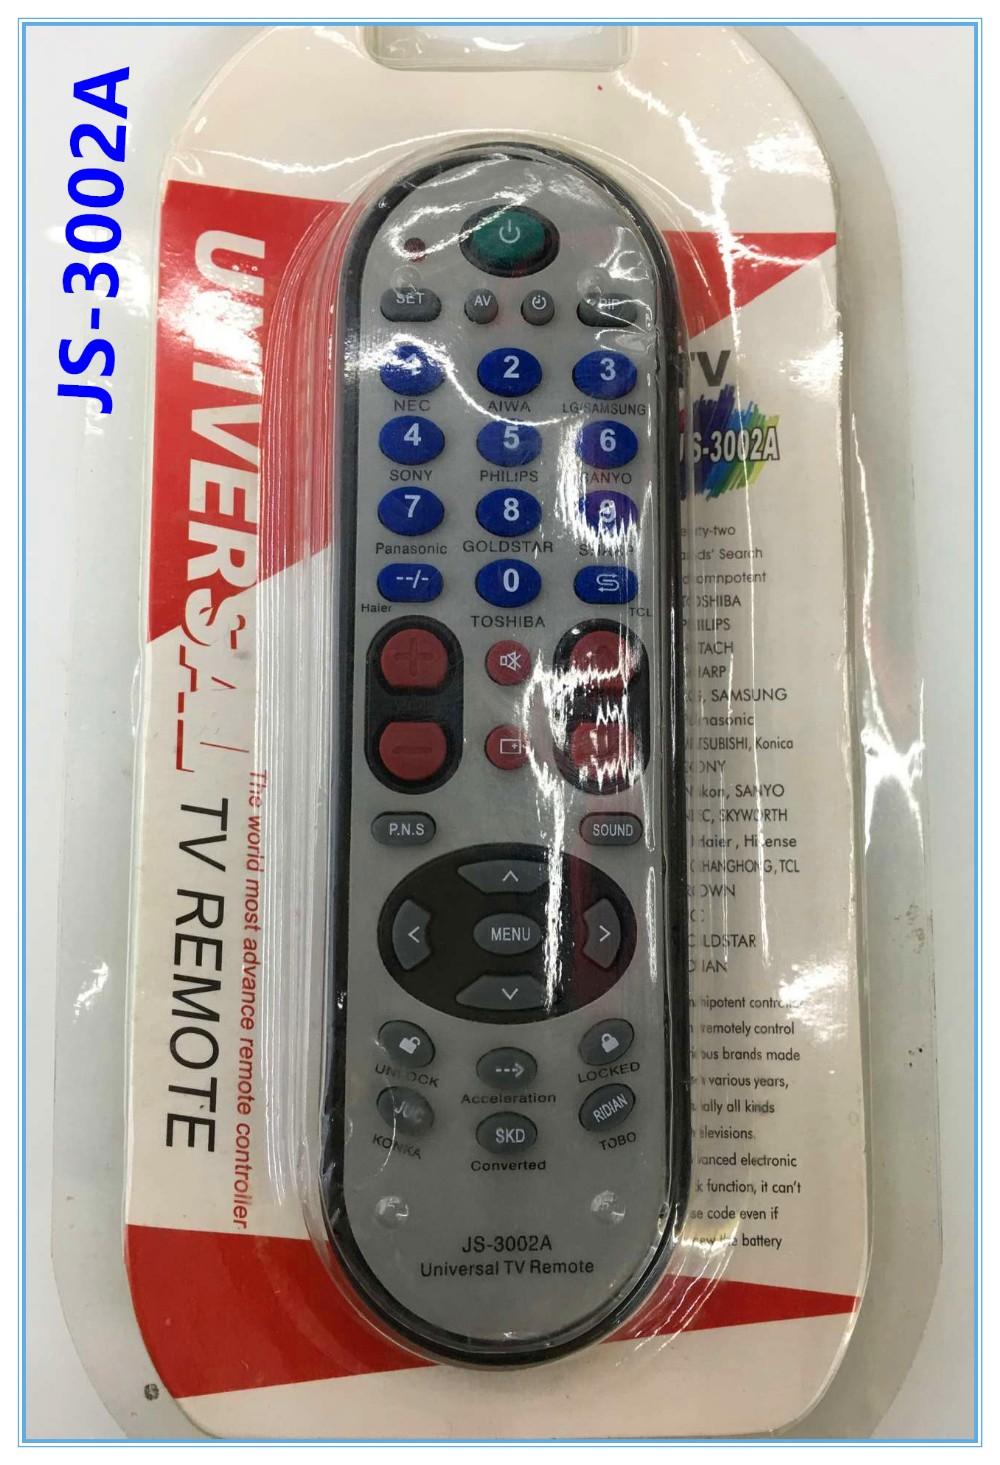 36 Keys High Quality Js-3002a Universal Tv Remote Control - Buy Universal  Remote Controller,Rca Universal Tv Remote Codes,Condor Universal Tv Remote